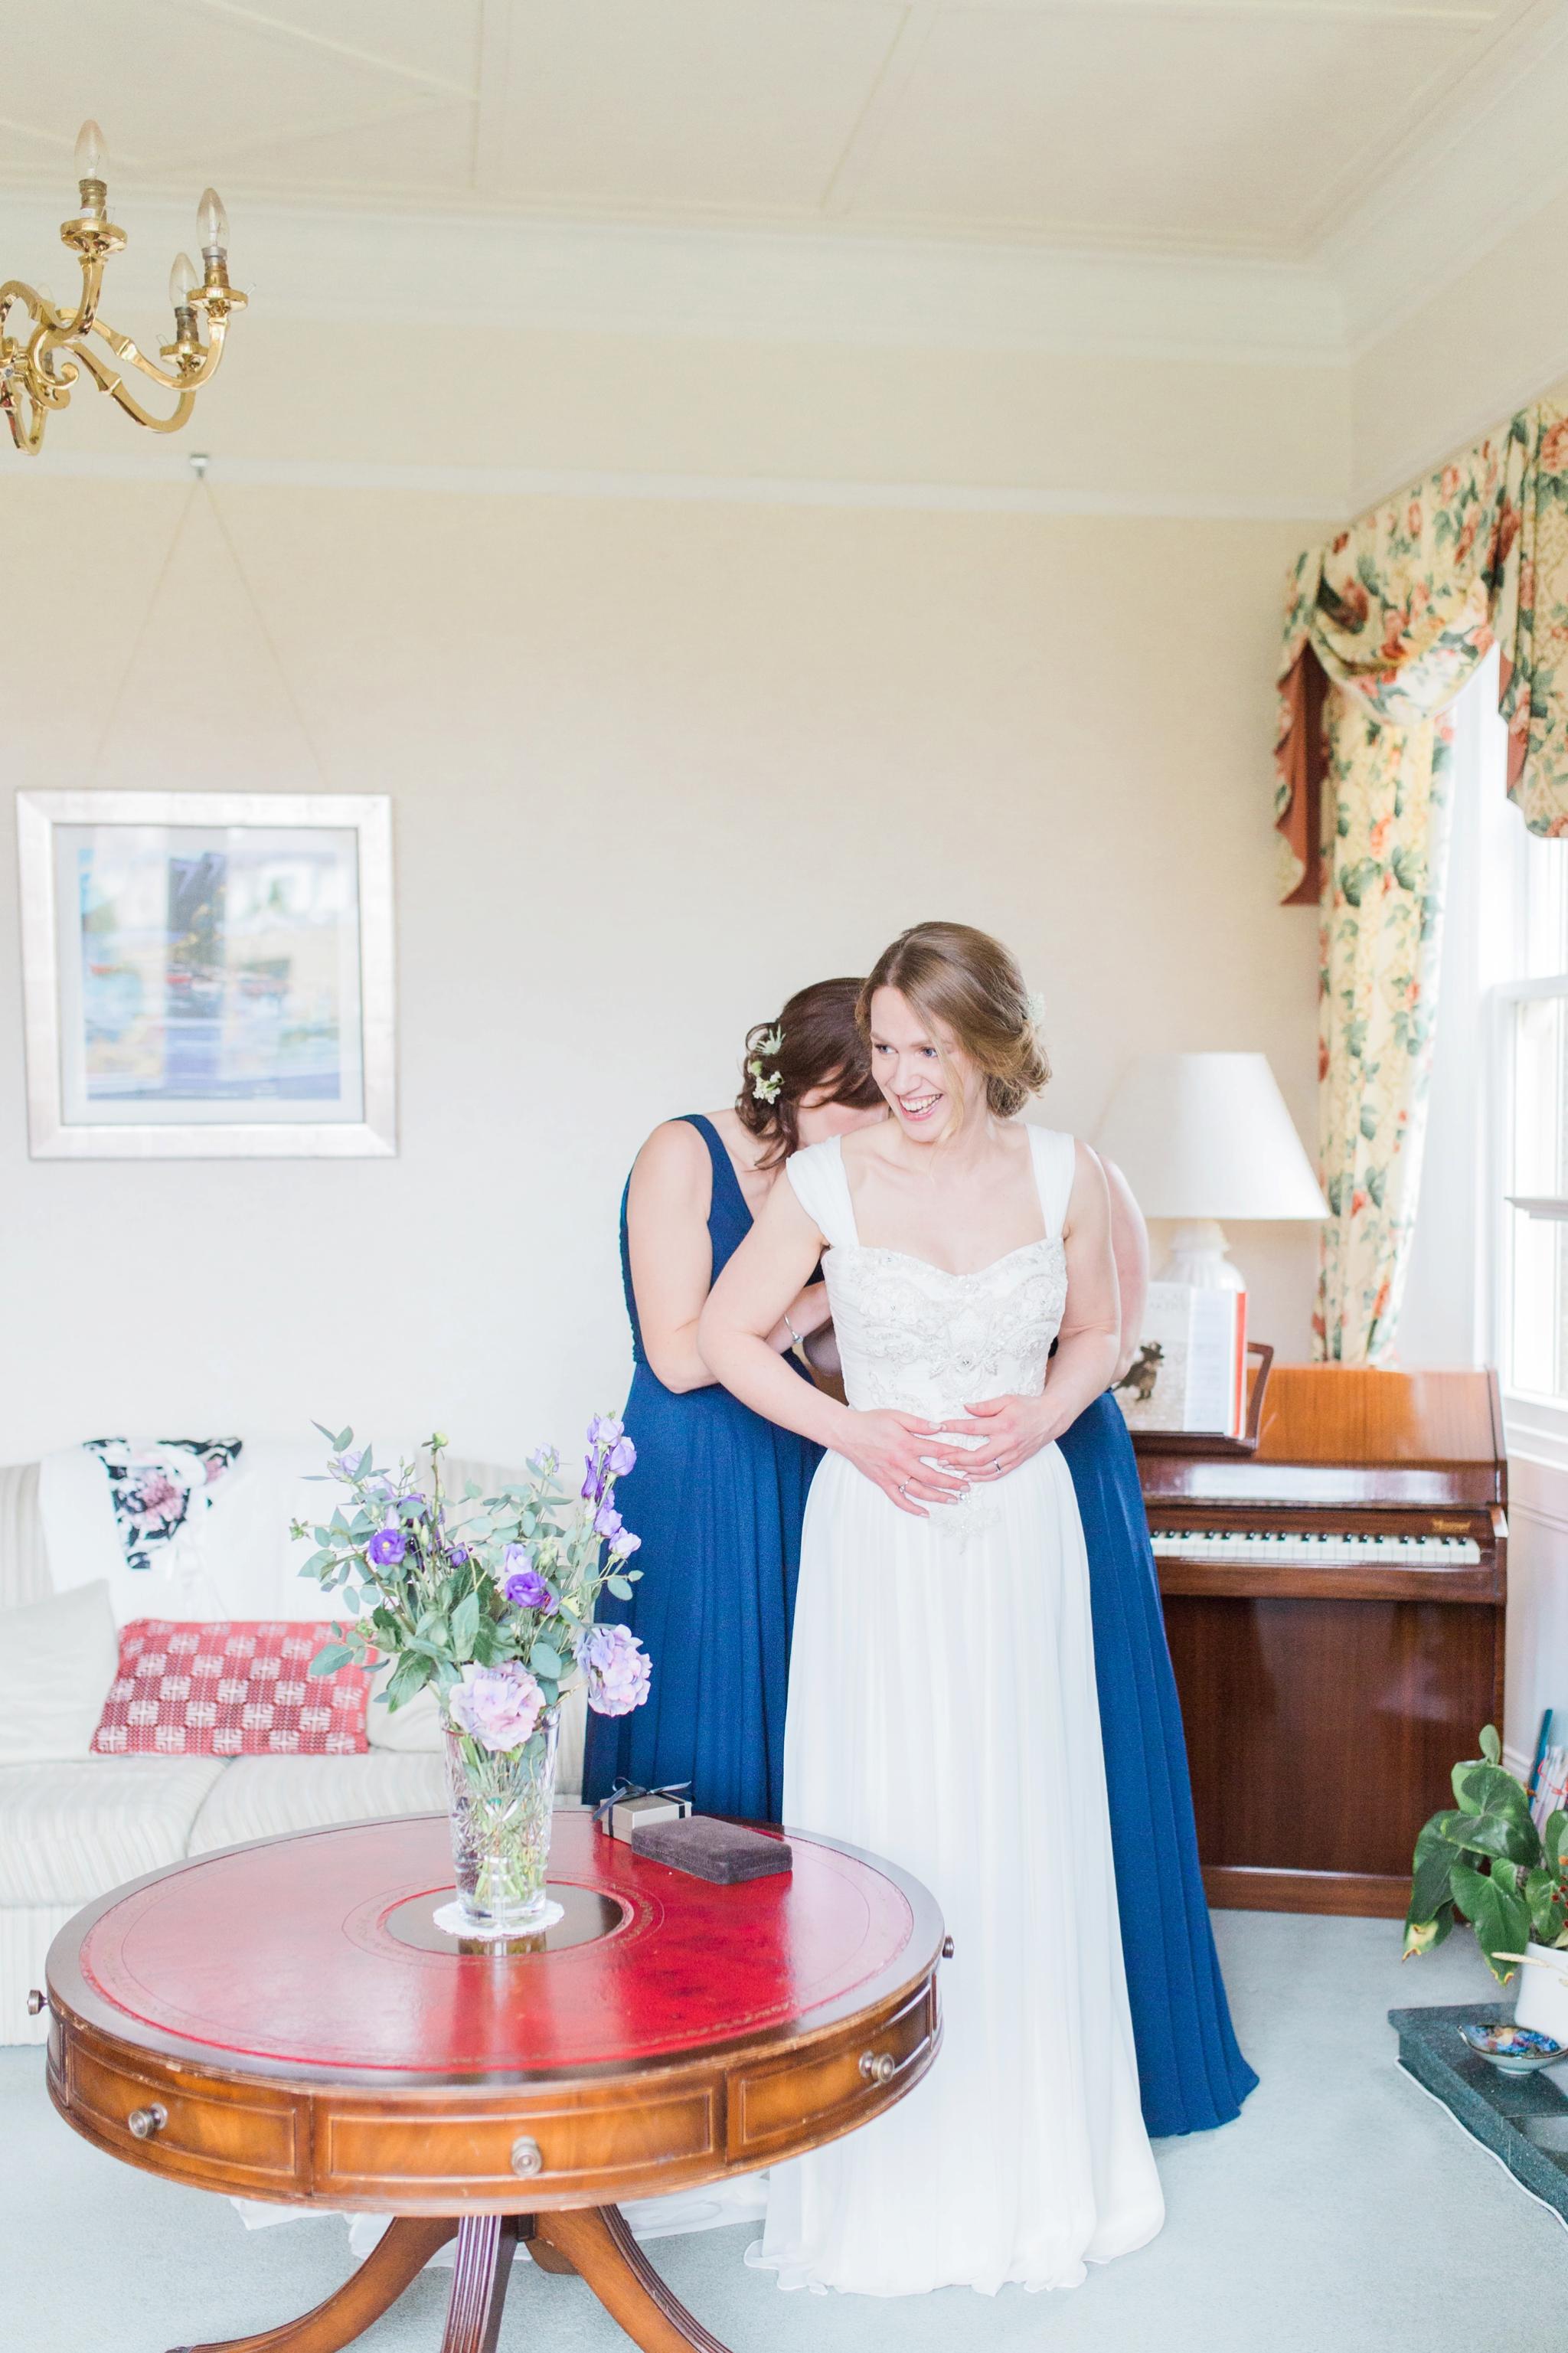 Suzanne_li_photography_kirknewton_wedding_0015.jpg